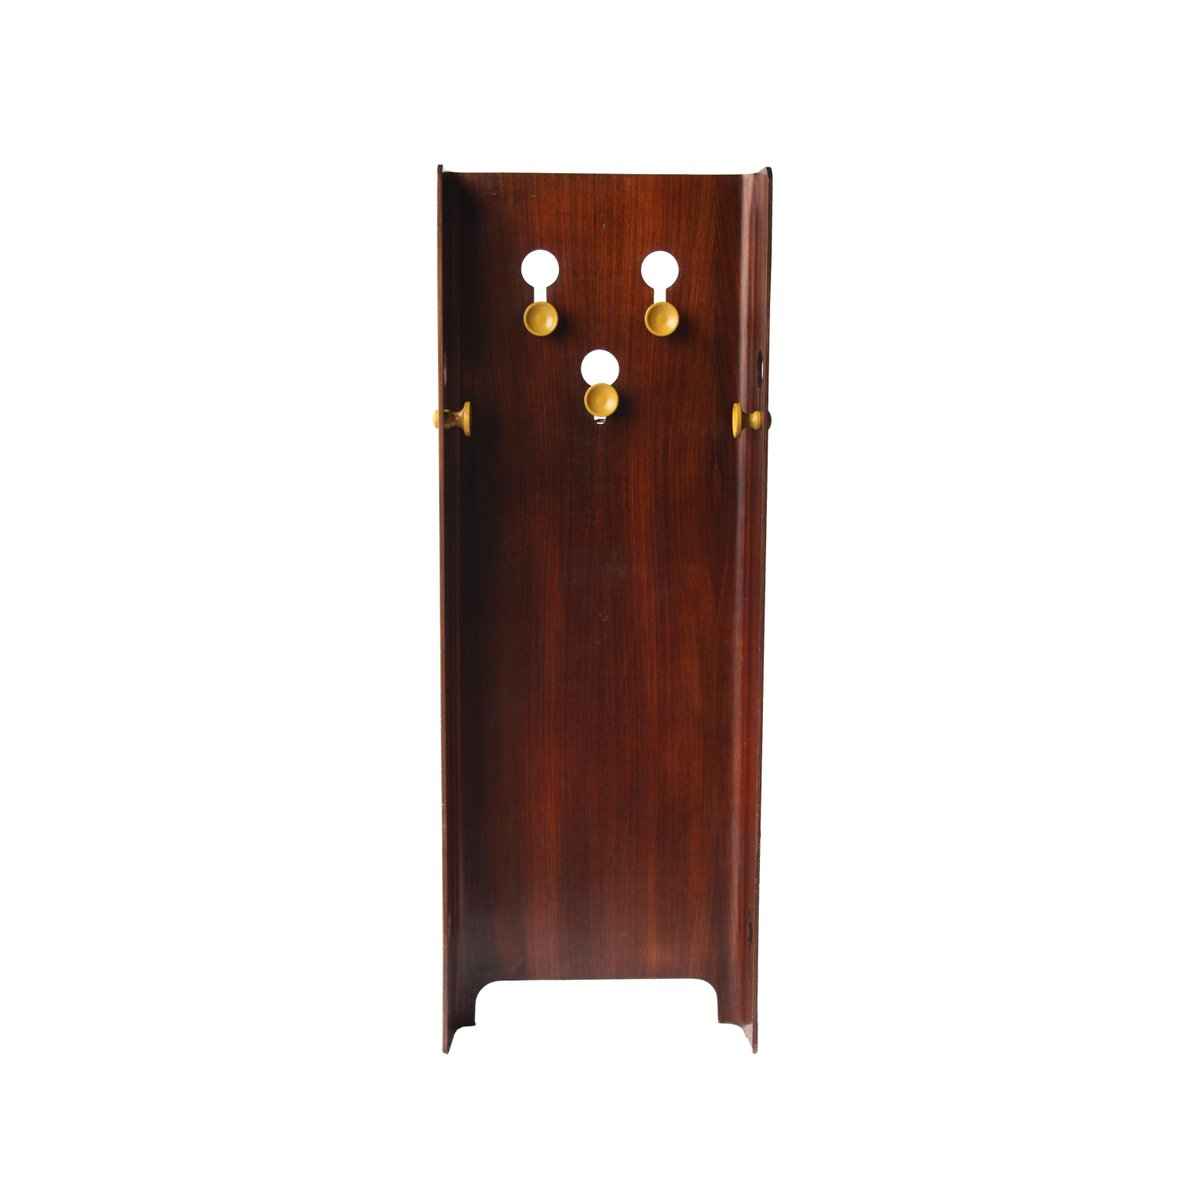 vintage rosewood wall mounted coat rack for sale at pamono. Black Bedroom Furniture Sets. Home Design Ideas